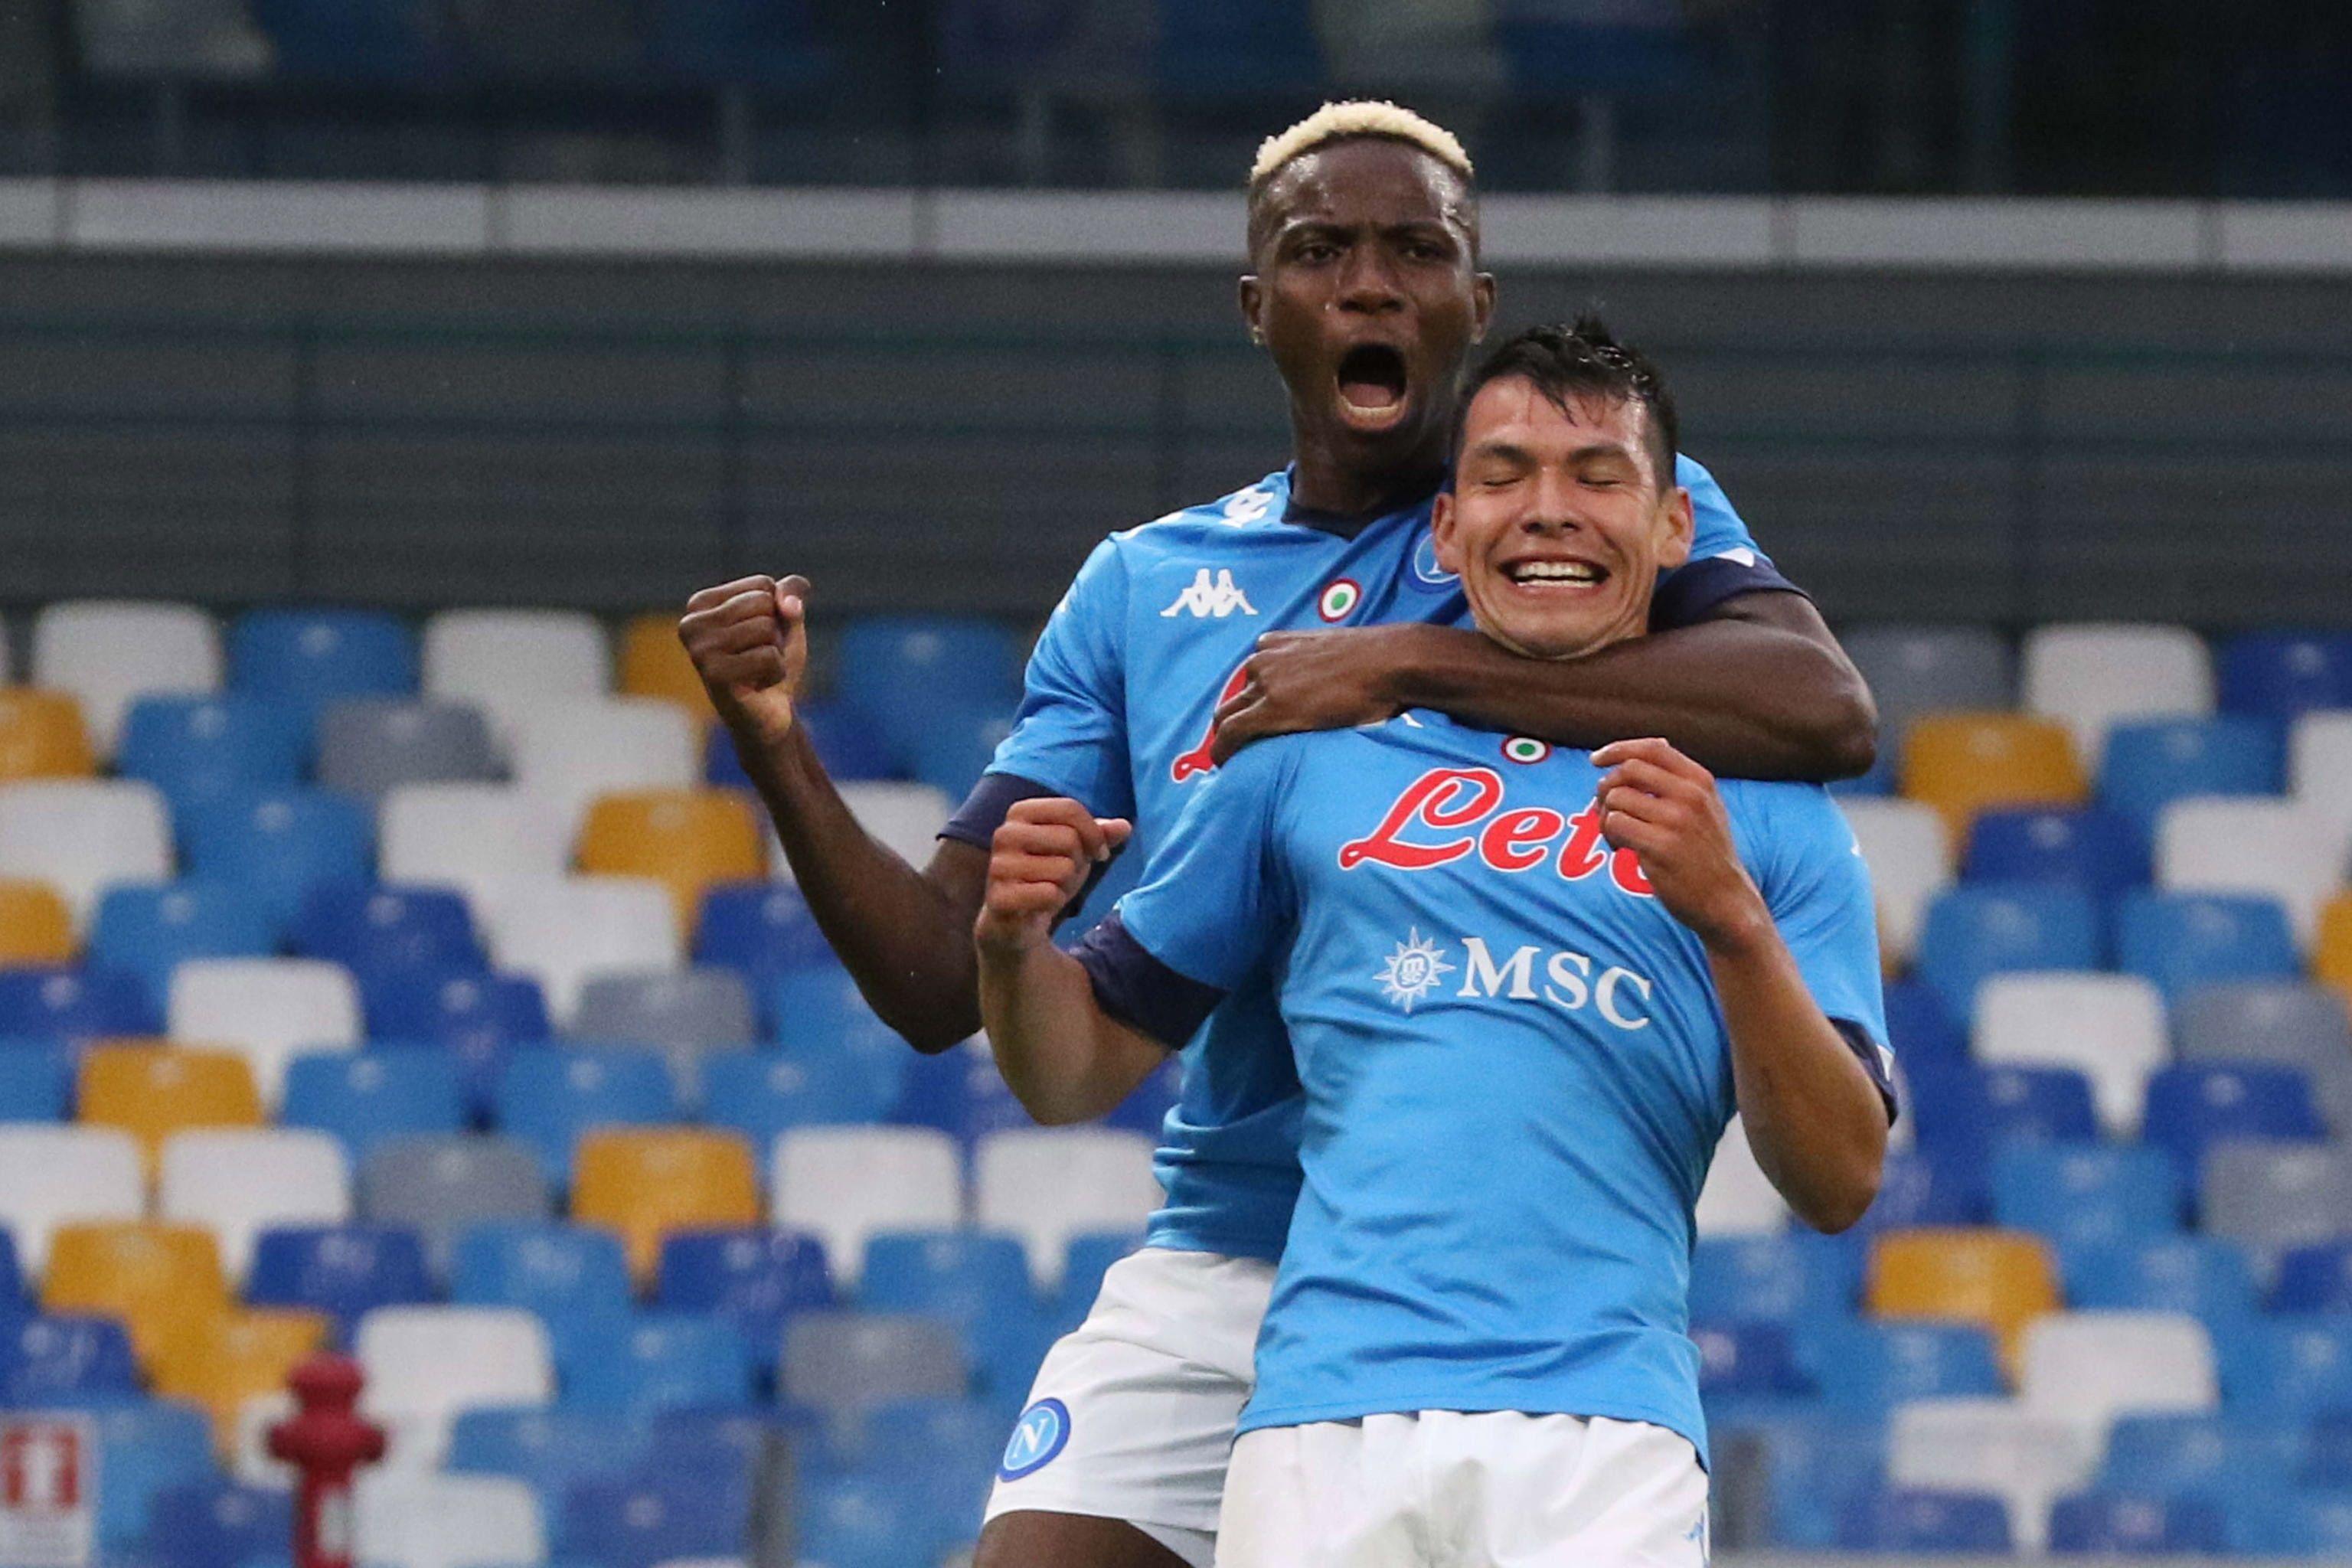 Hirving Lozano anotó dos goles contra el Génova, equipo que presentó 19 casos positivos por COVID-19 (Foto: Cesare Abbate/ EFE)